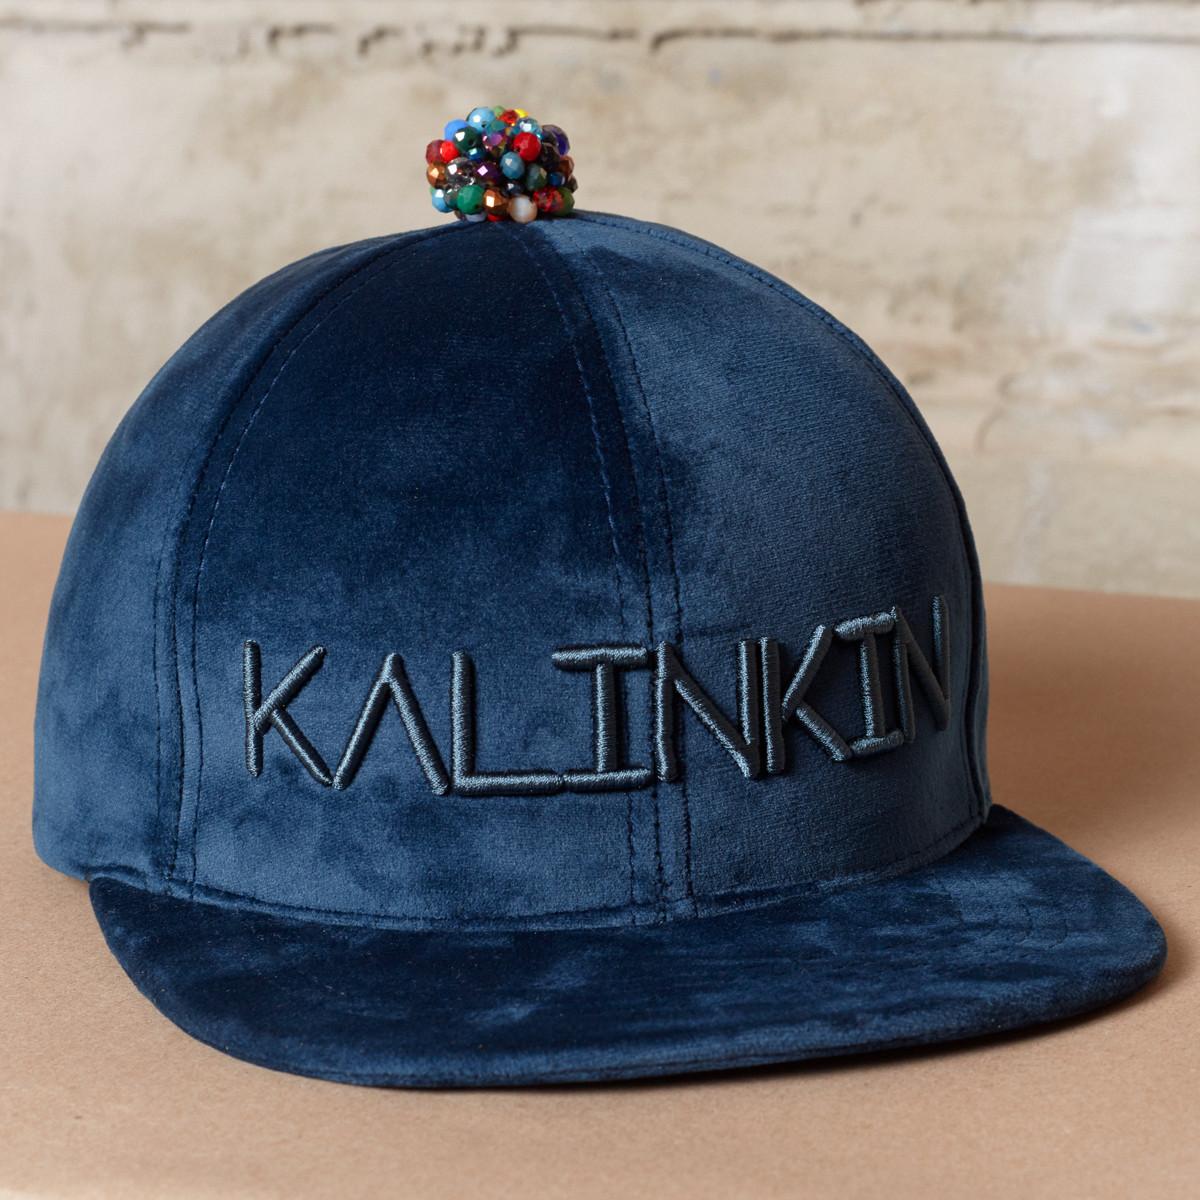 IT'S KALINKIN cap - royal blue